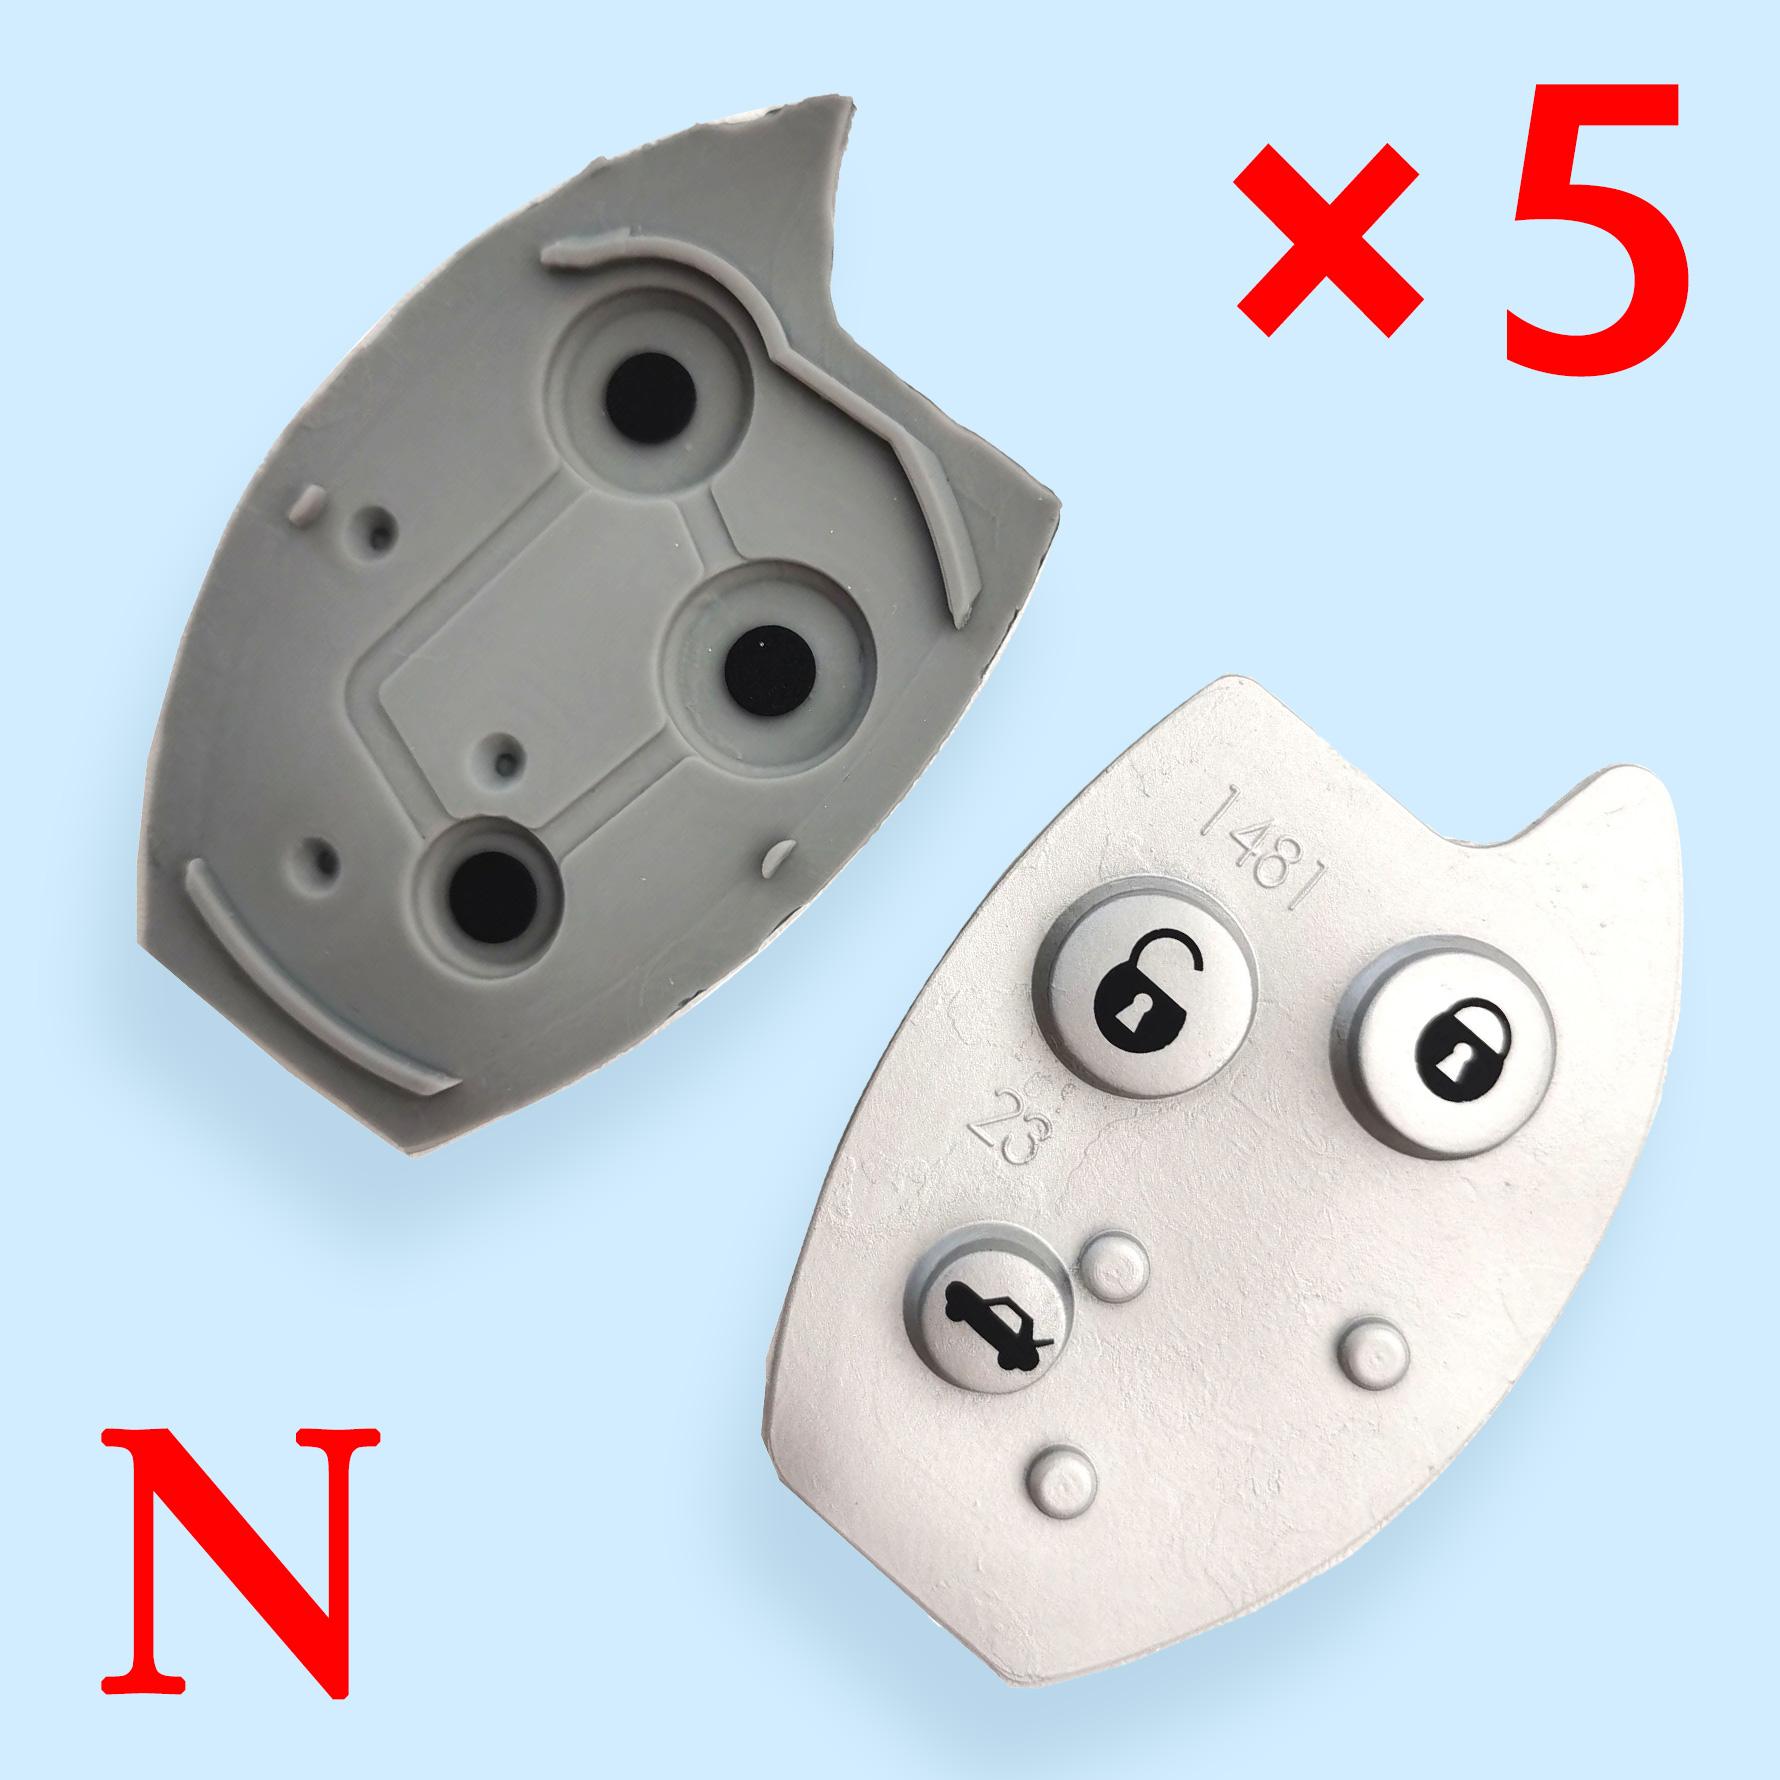 3 Buttons Key Shell Rubber Pad for Citroen - 5 pcs